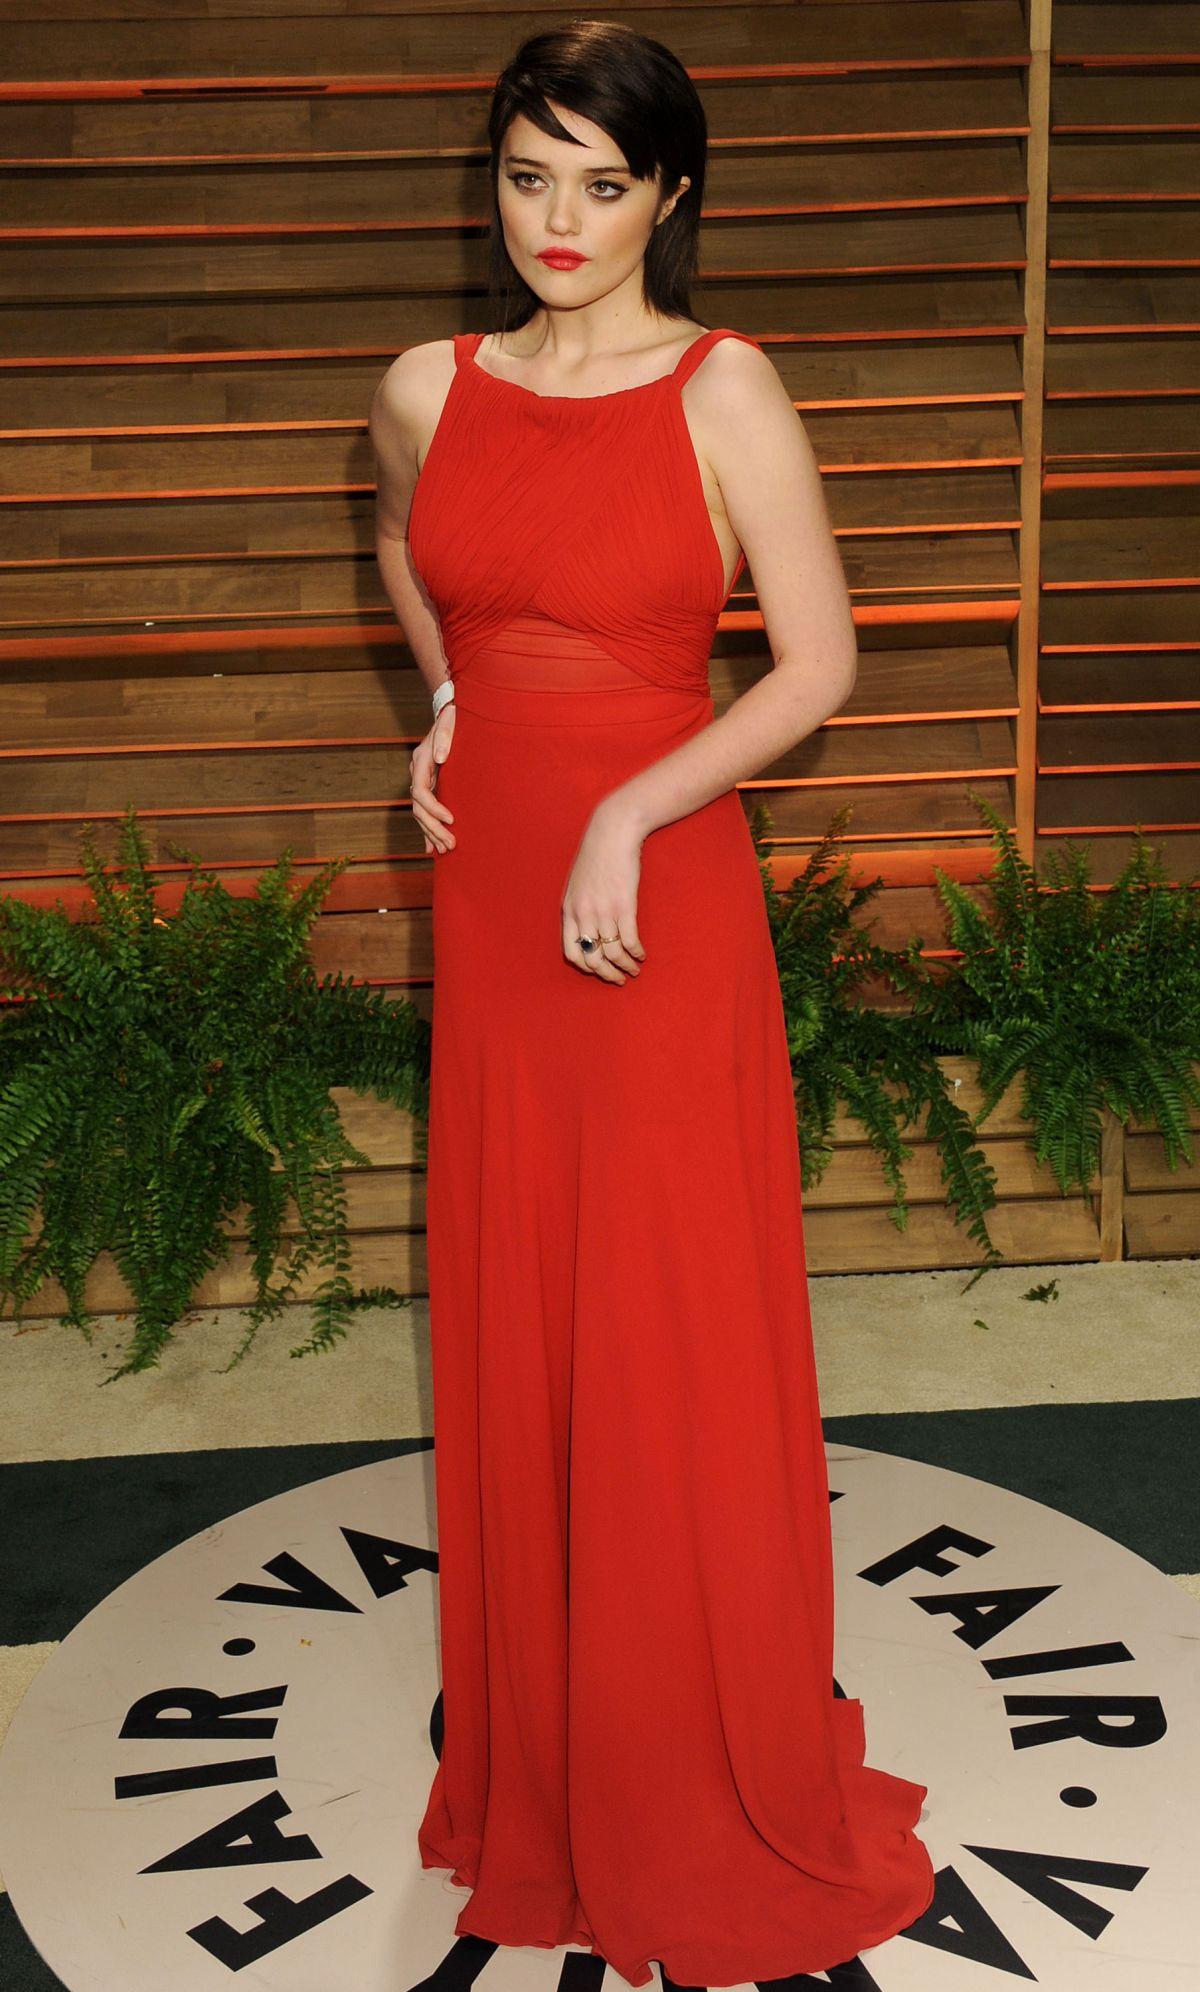 SKY FERREIRA at Vanity Fair Oscar Party in Hollywood